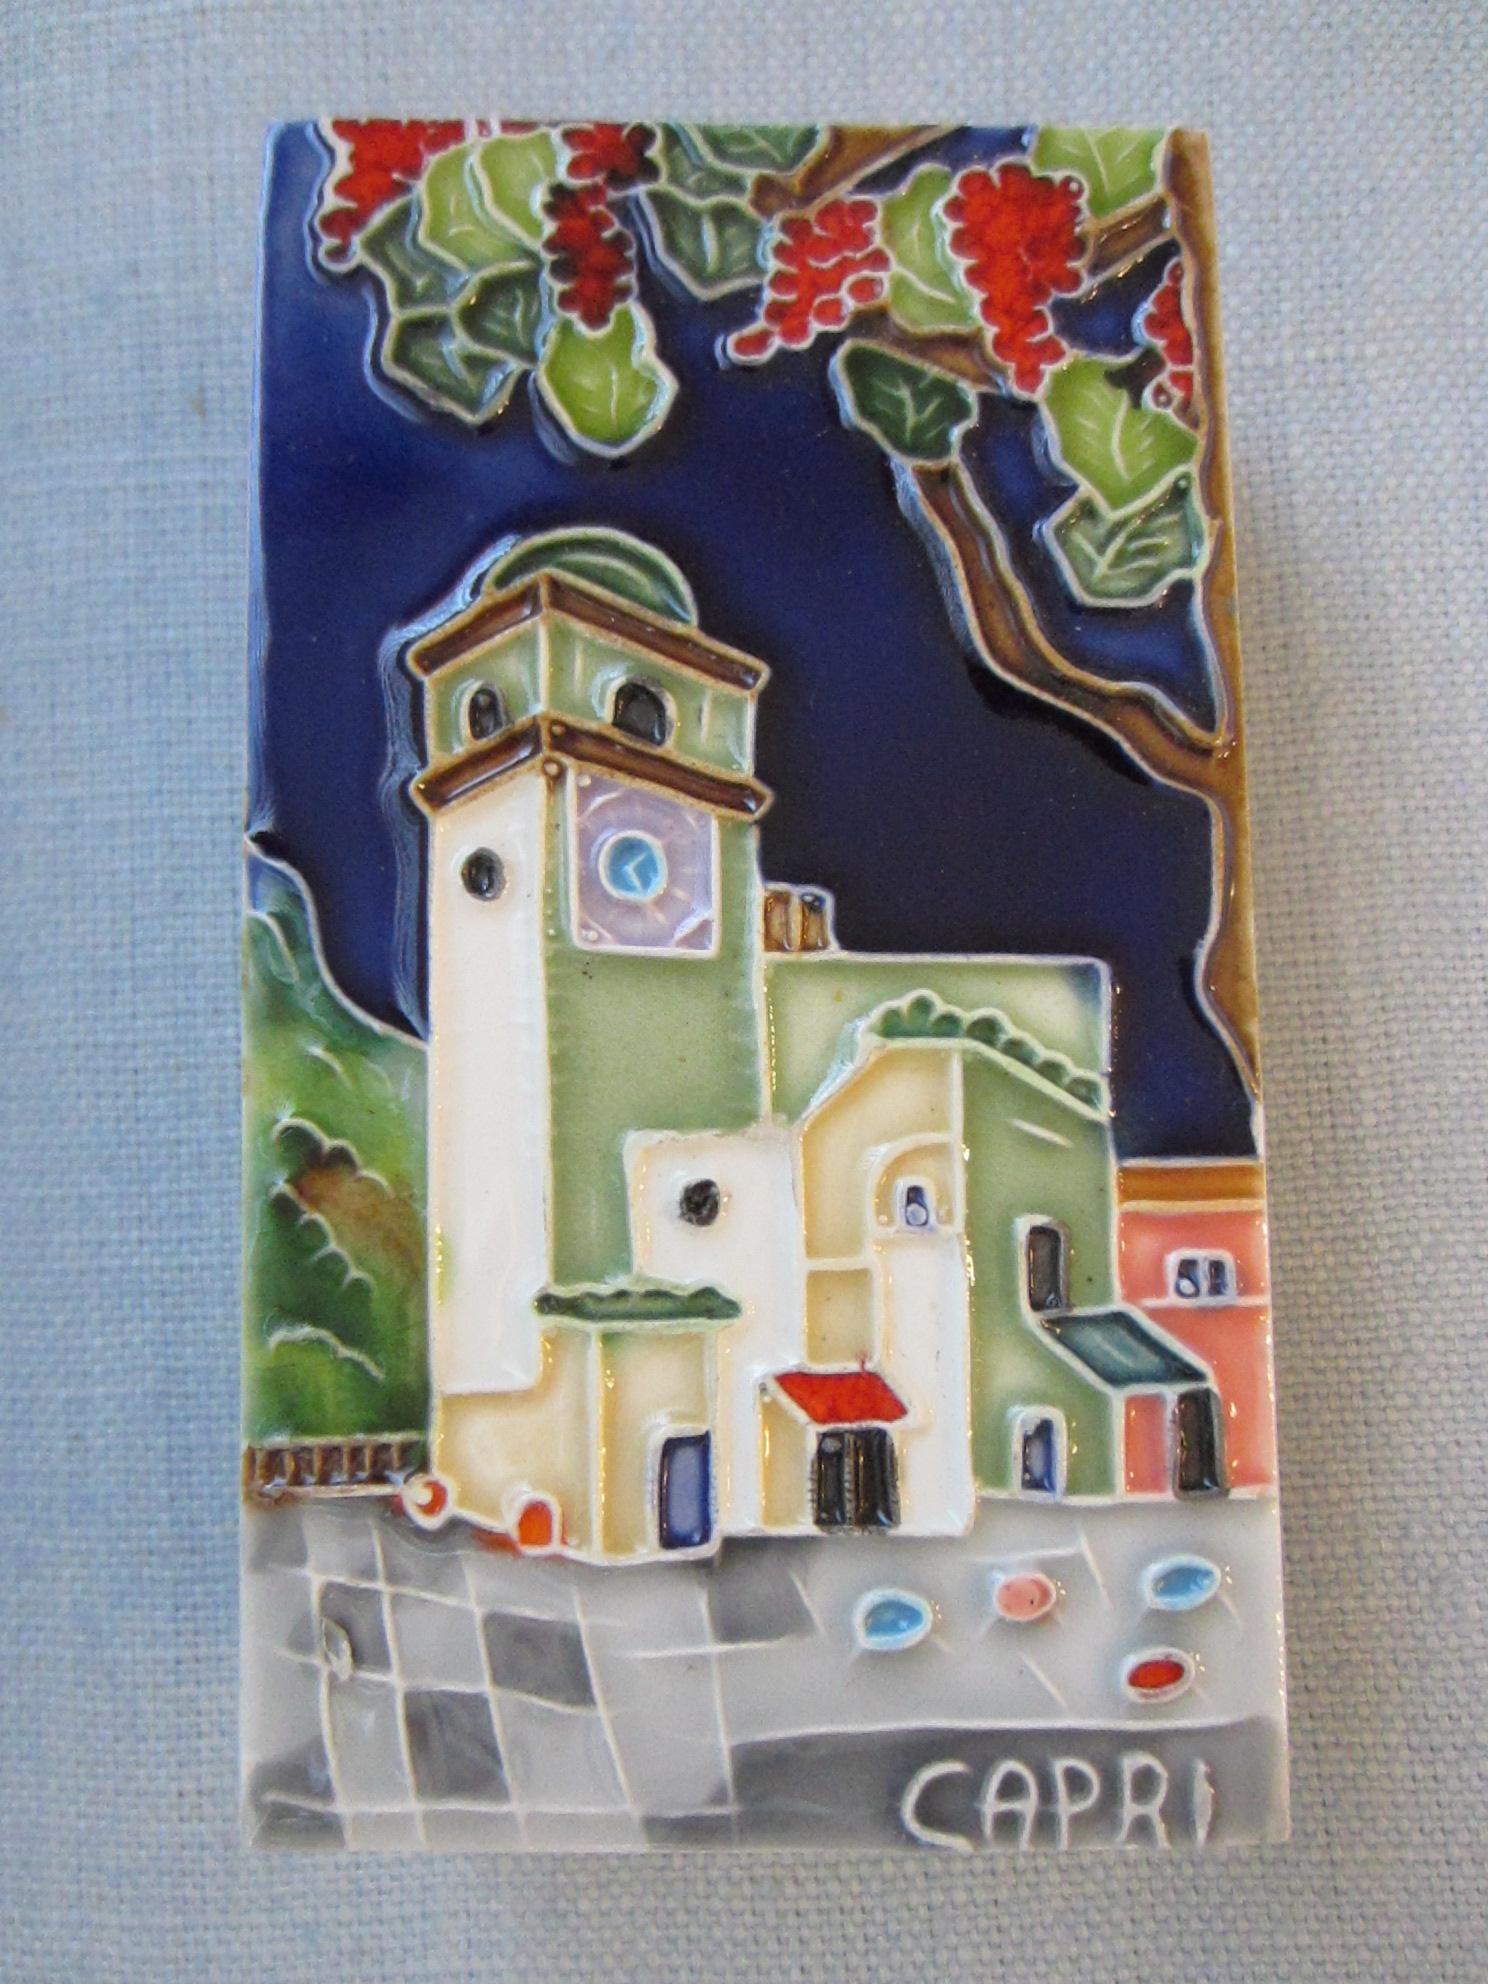 Ceramic Tile Capri Italy Match Box For Sale